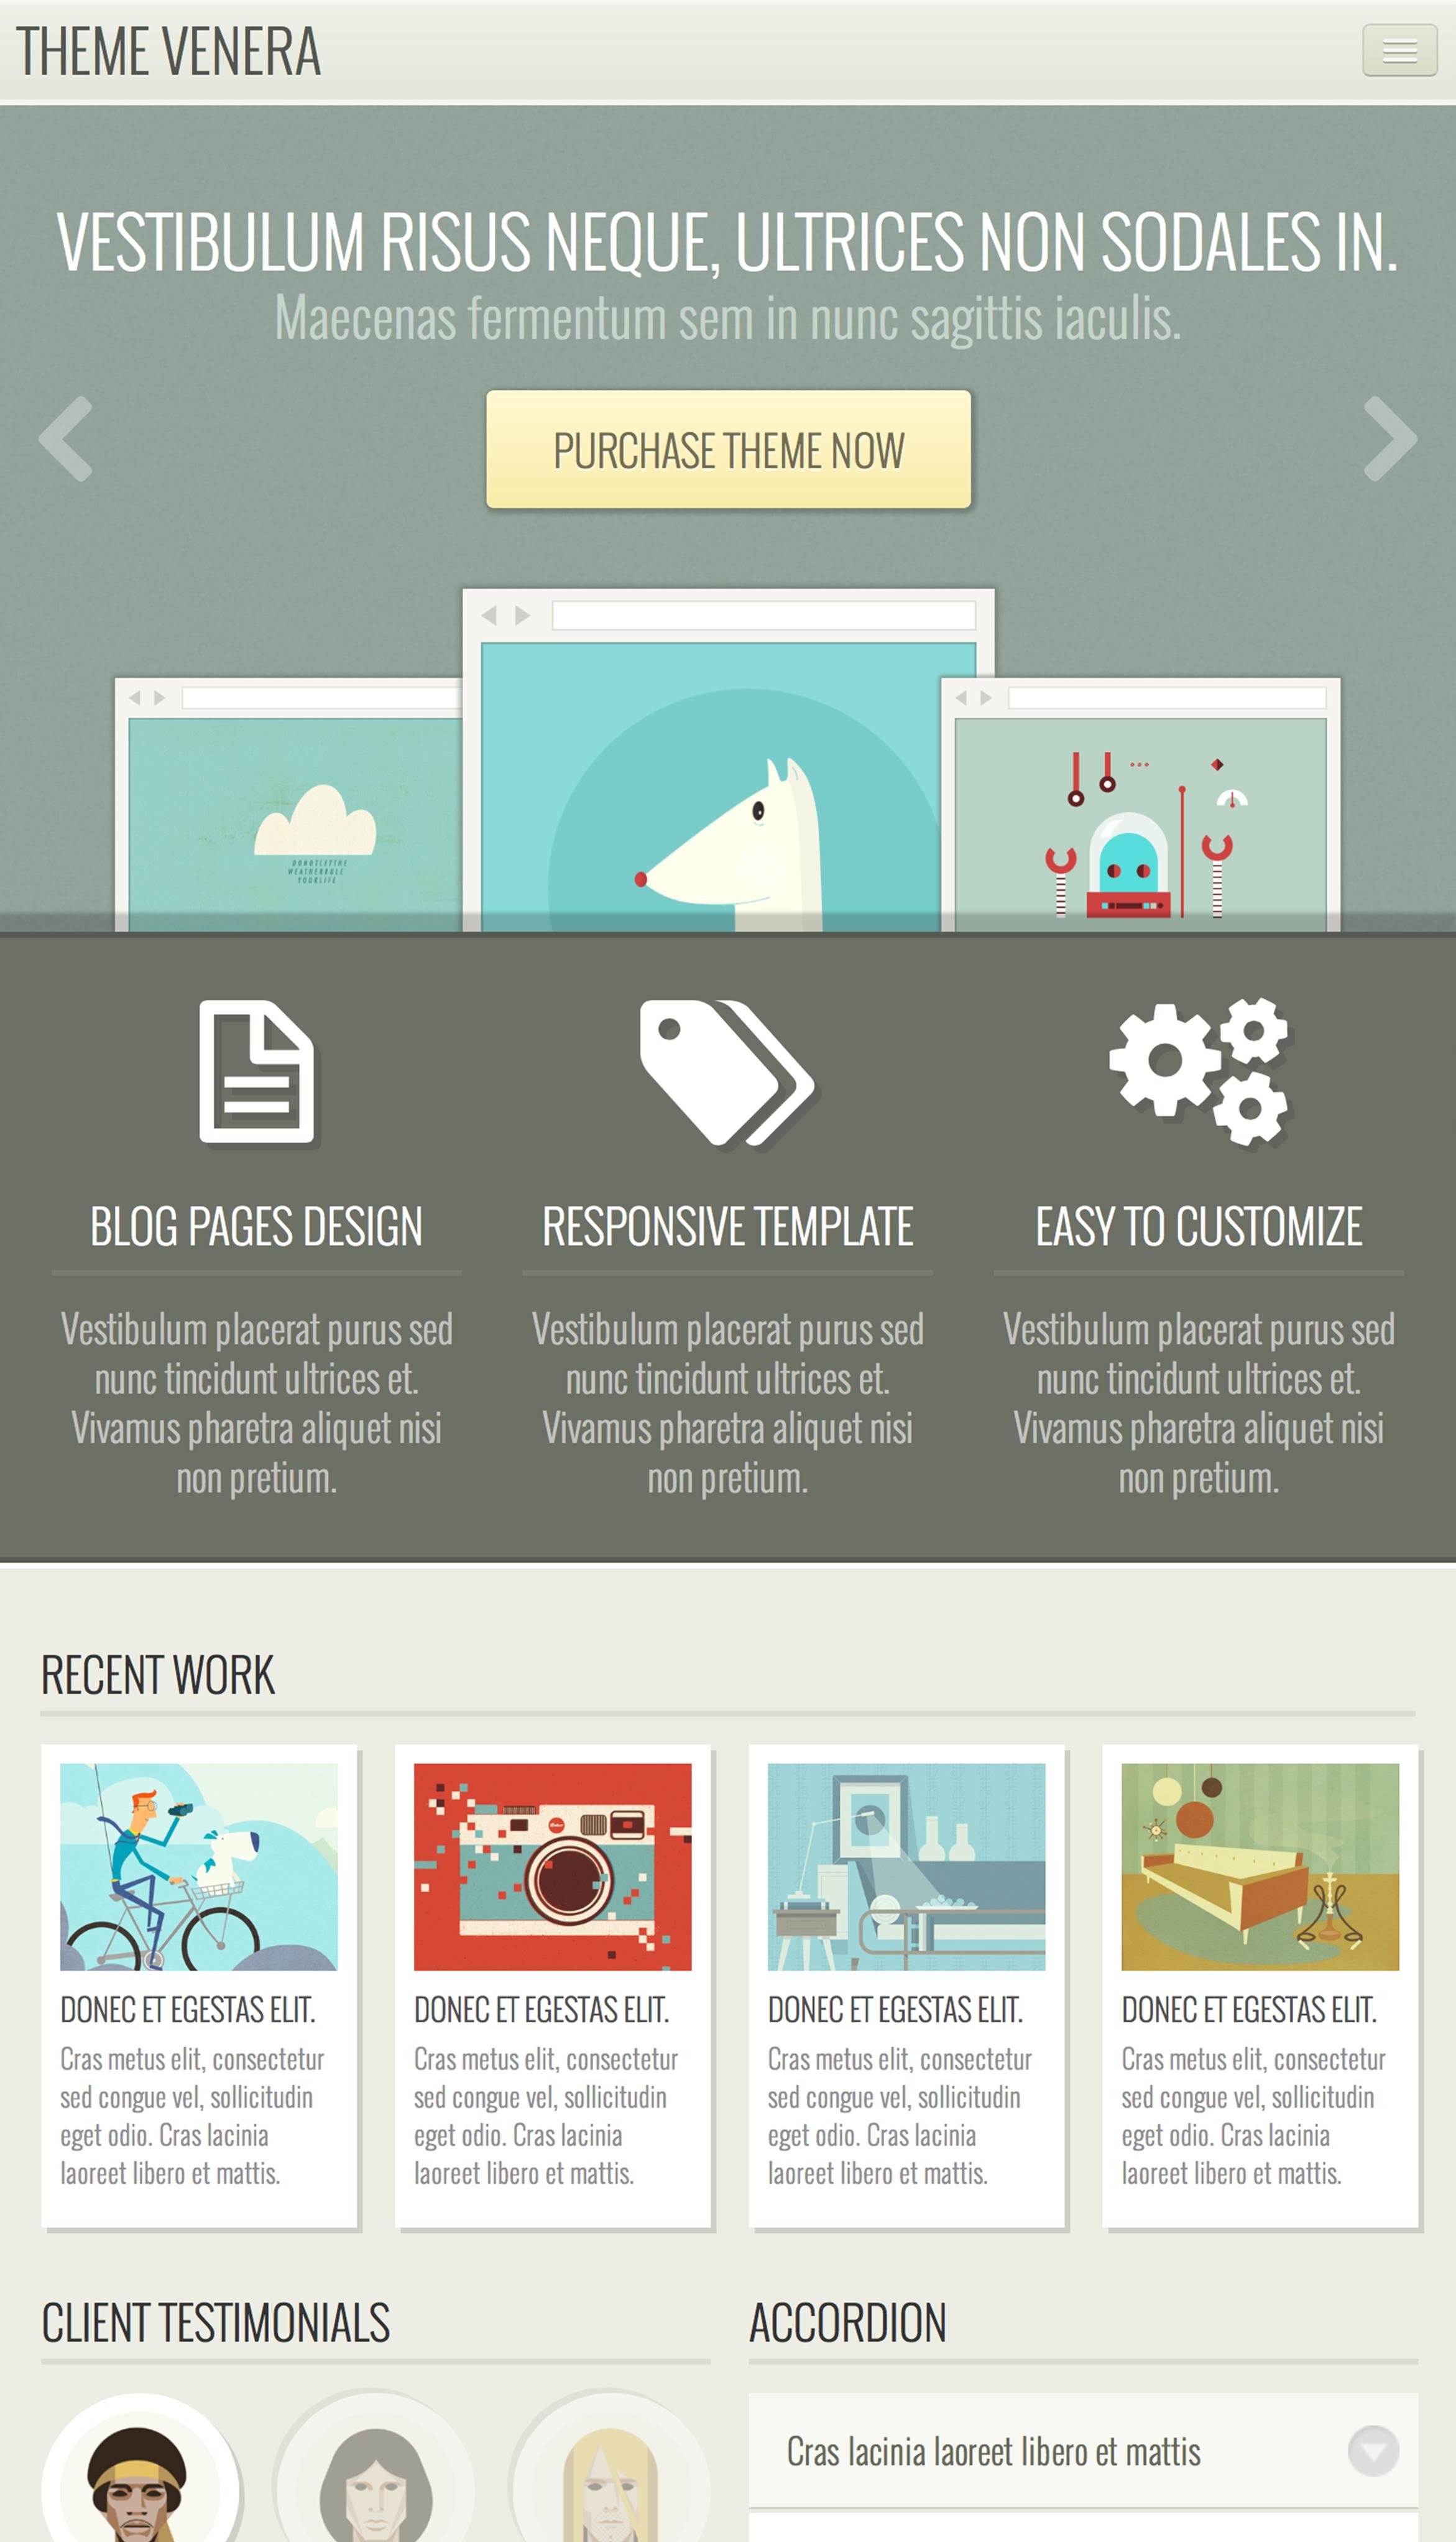 Venera - Responsive HTML Template - Retro colors | Infographies ...